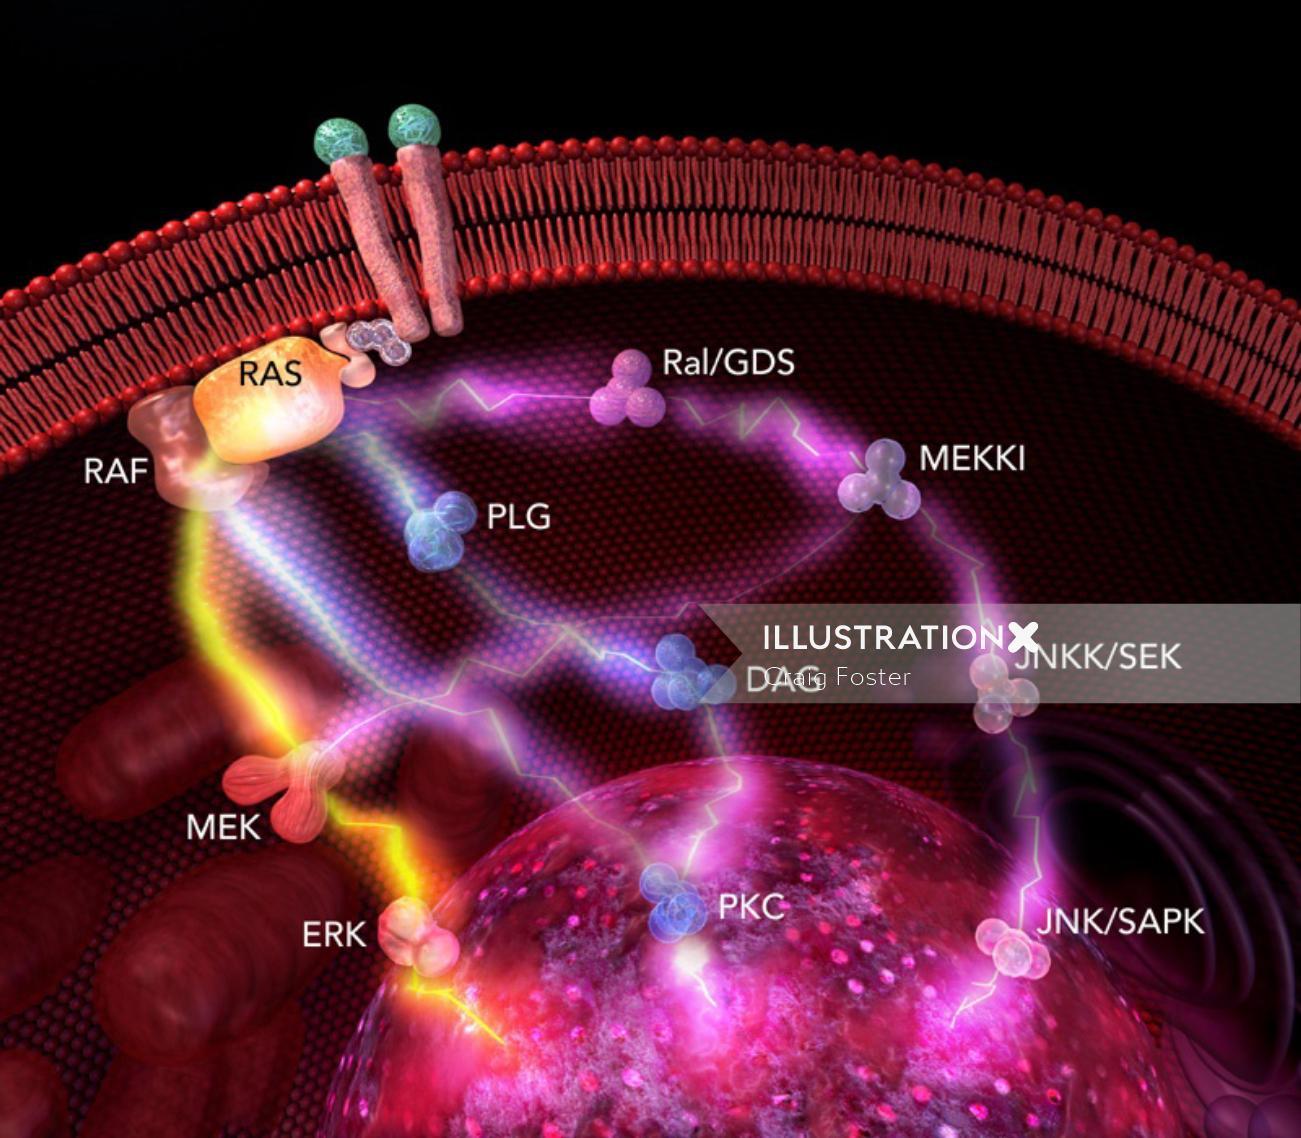 An illustration of protein pathways